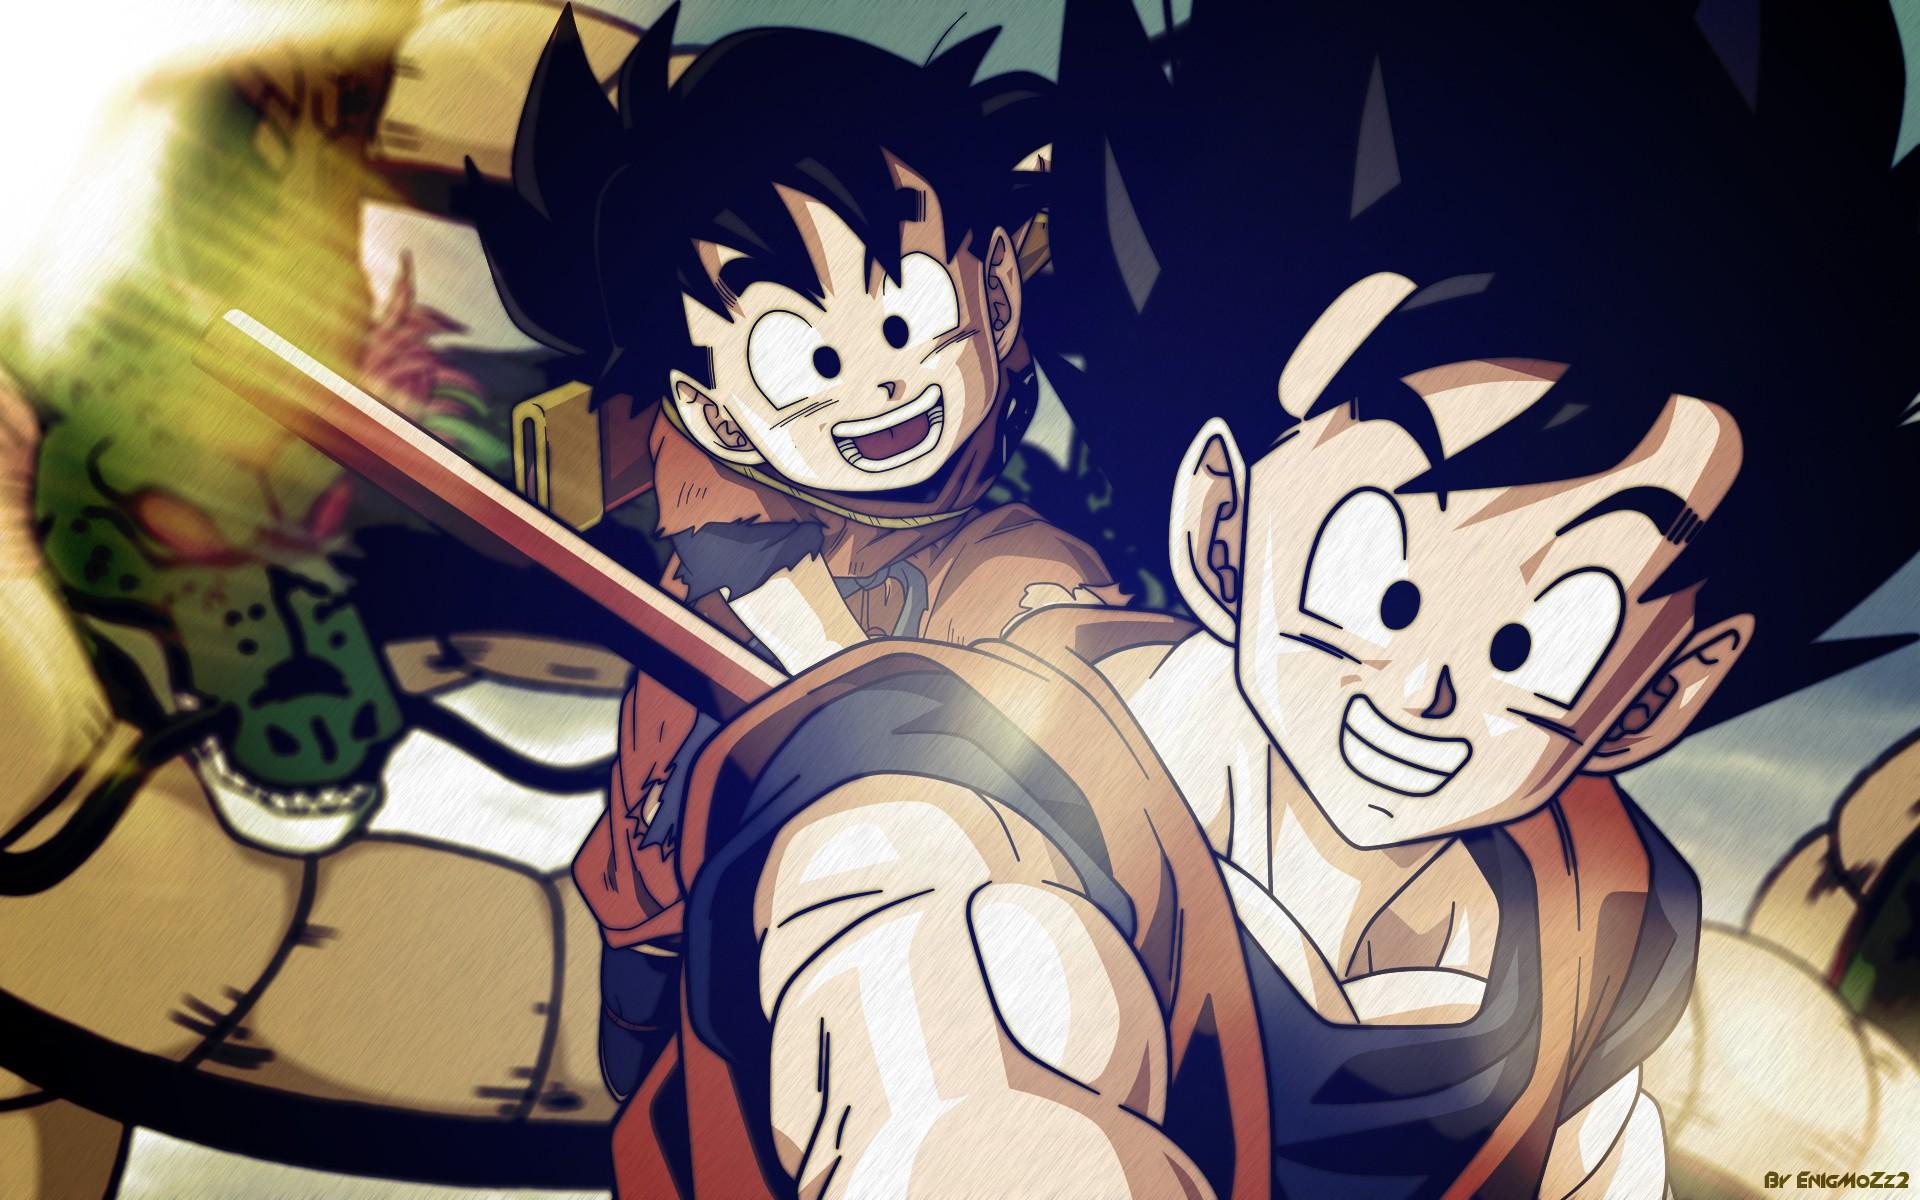 Dragon Ball Z Goku Gohan Wallpaper HD 4451 Wallpaper ForWallpapers 1920x1200